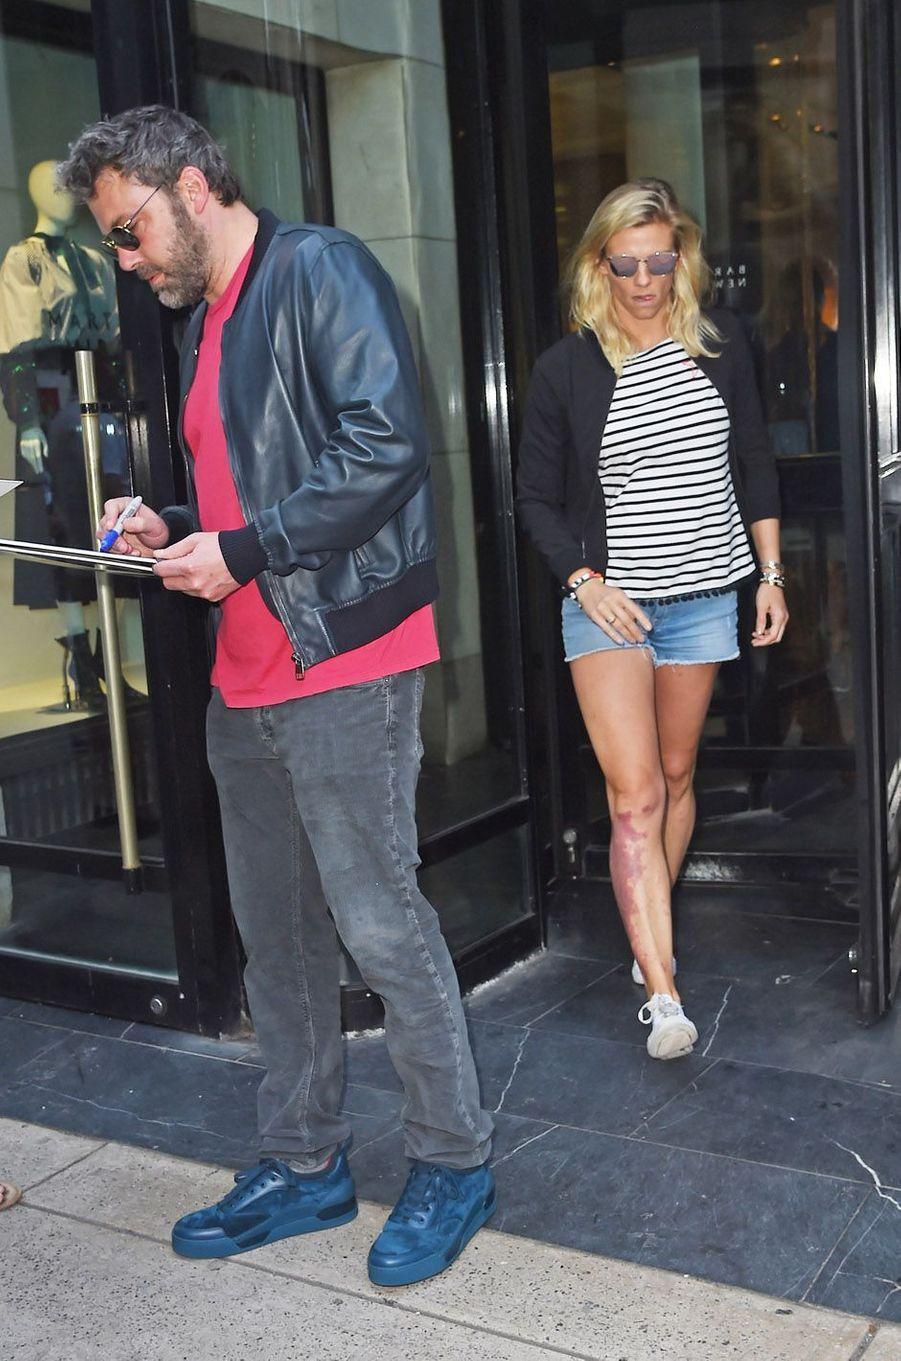 Ben Affleck et Lindsay Shookus à la sortie du magasin Barneys à New York, le 20 août 2017.